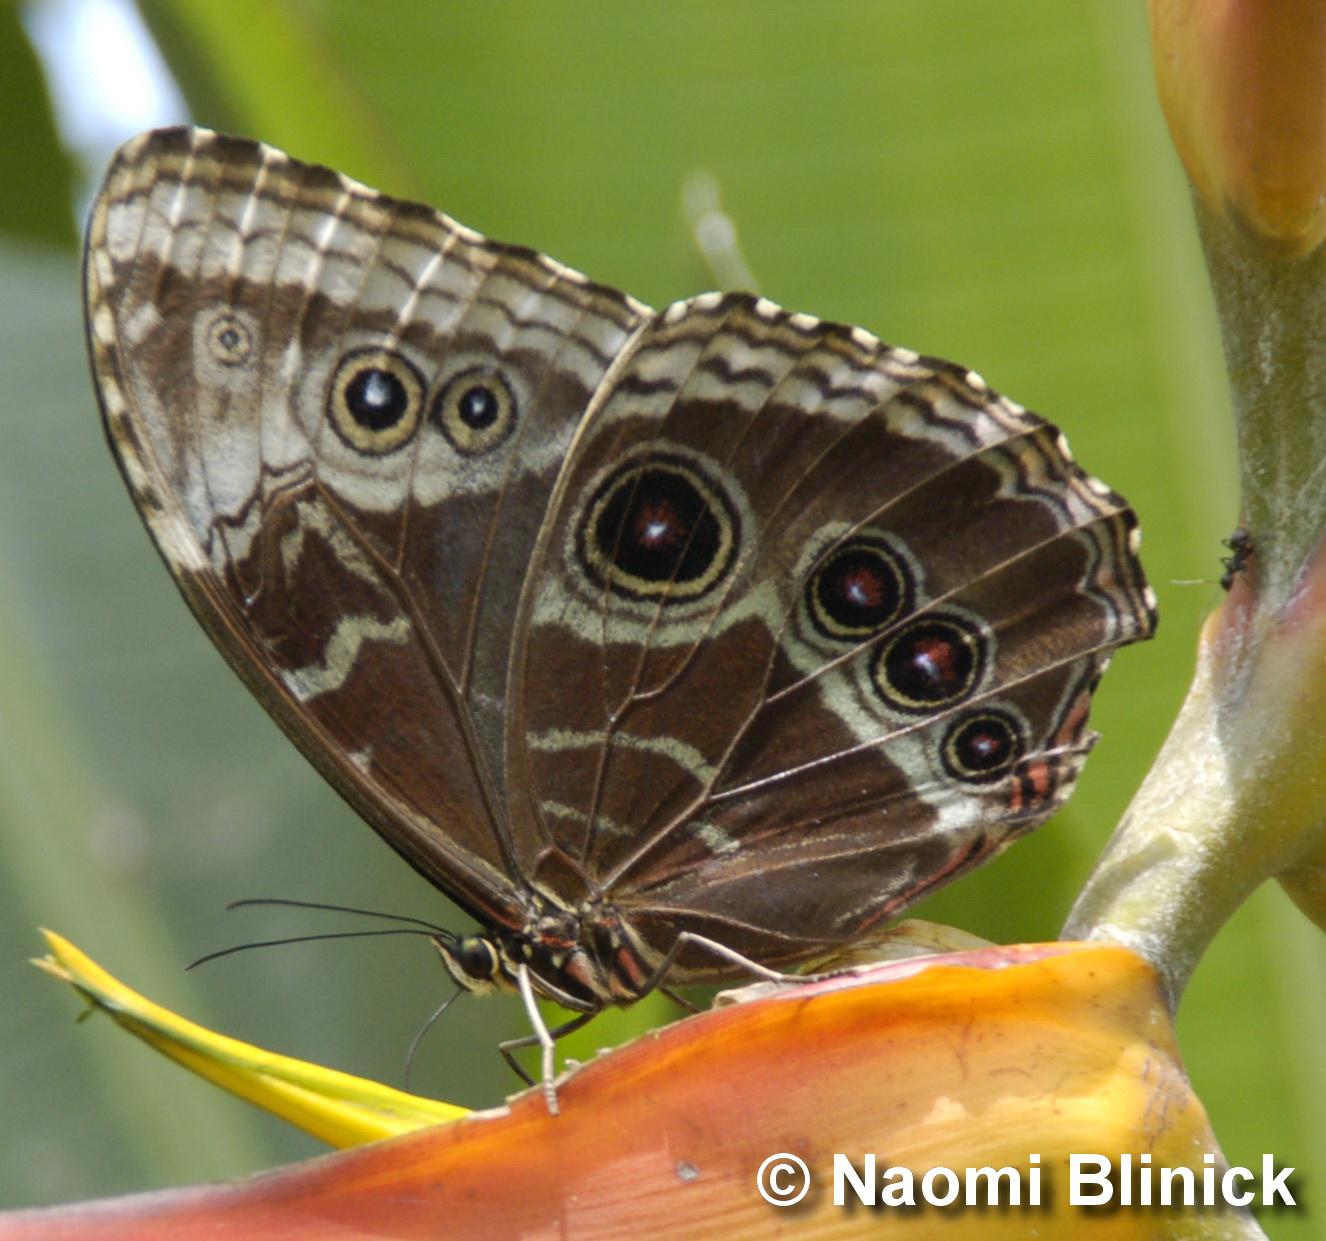 Bộ sưu tập cánh vẩy 6 - Page 6 Dominical-butterfly-2-naomi-blinick_0